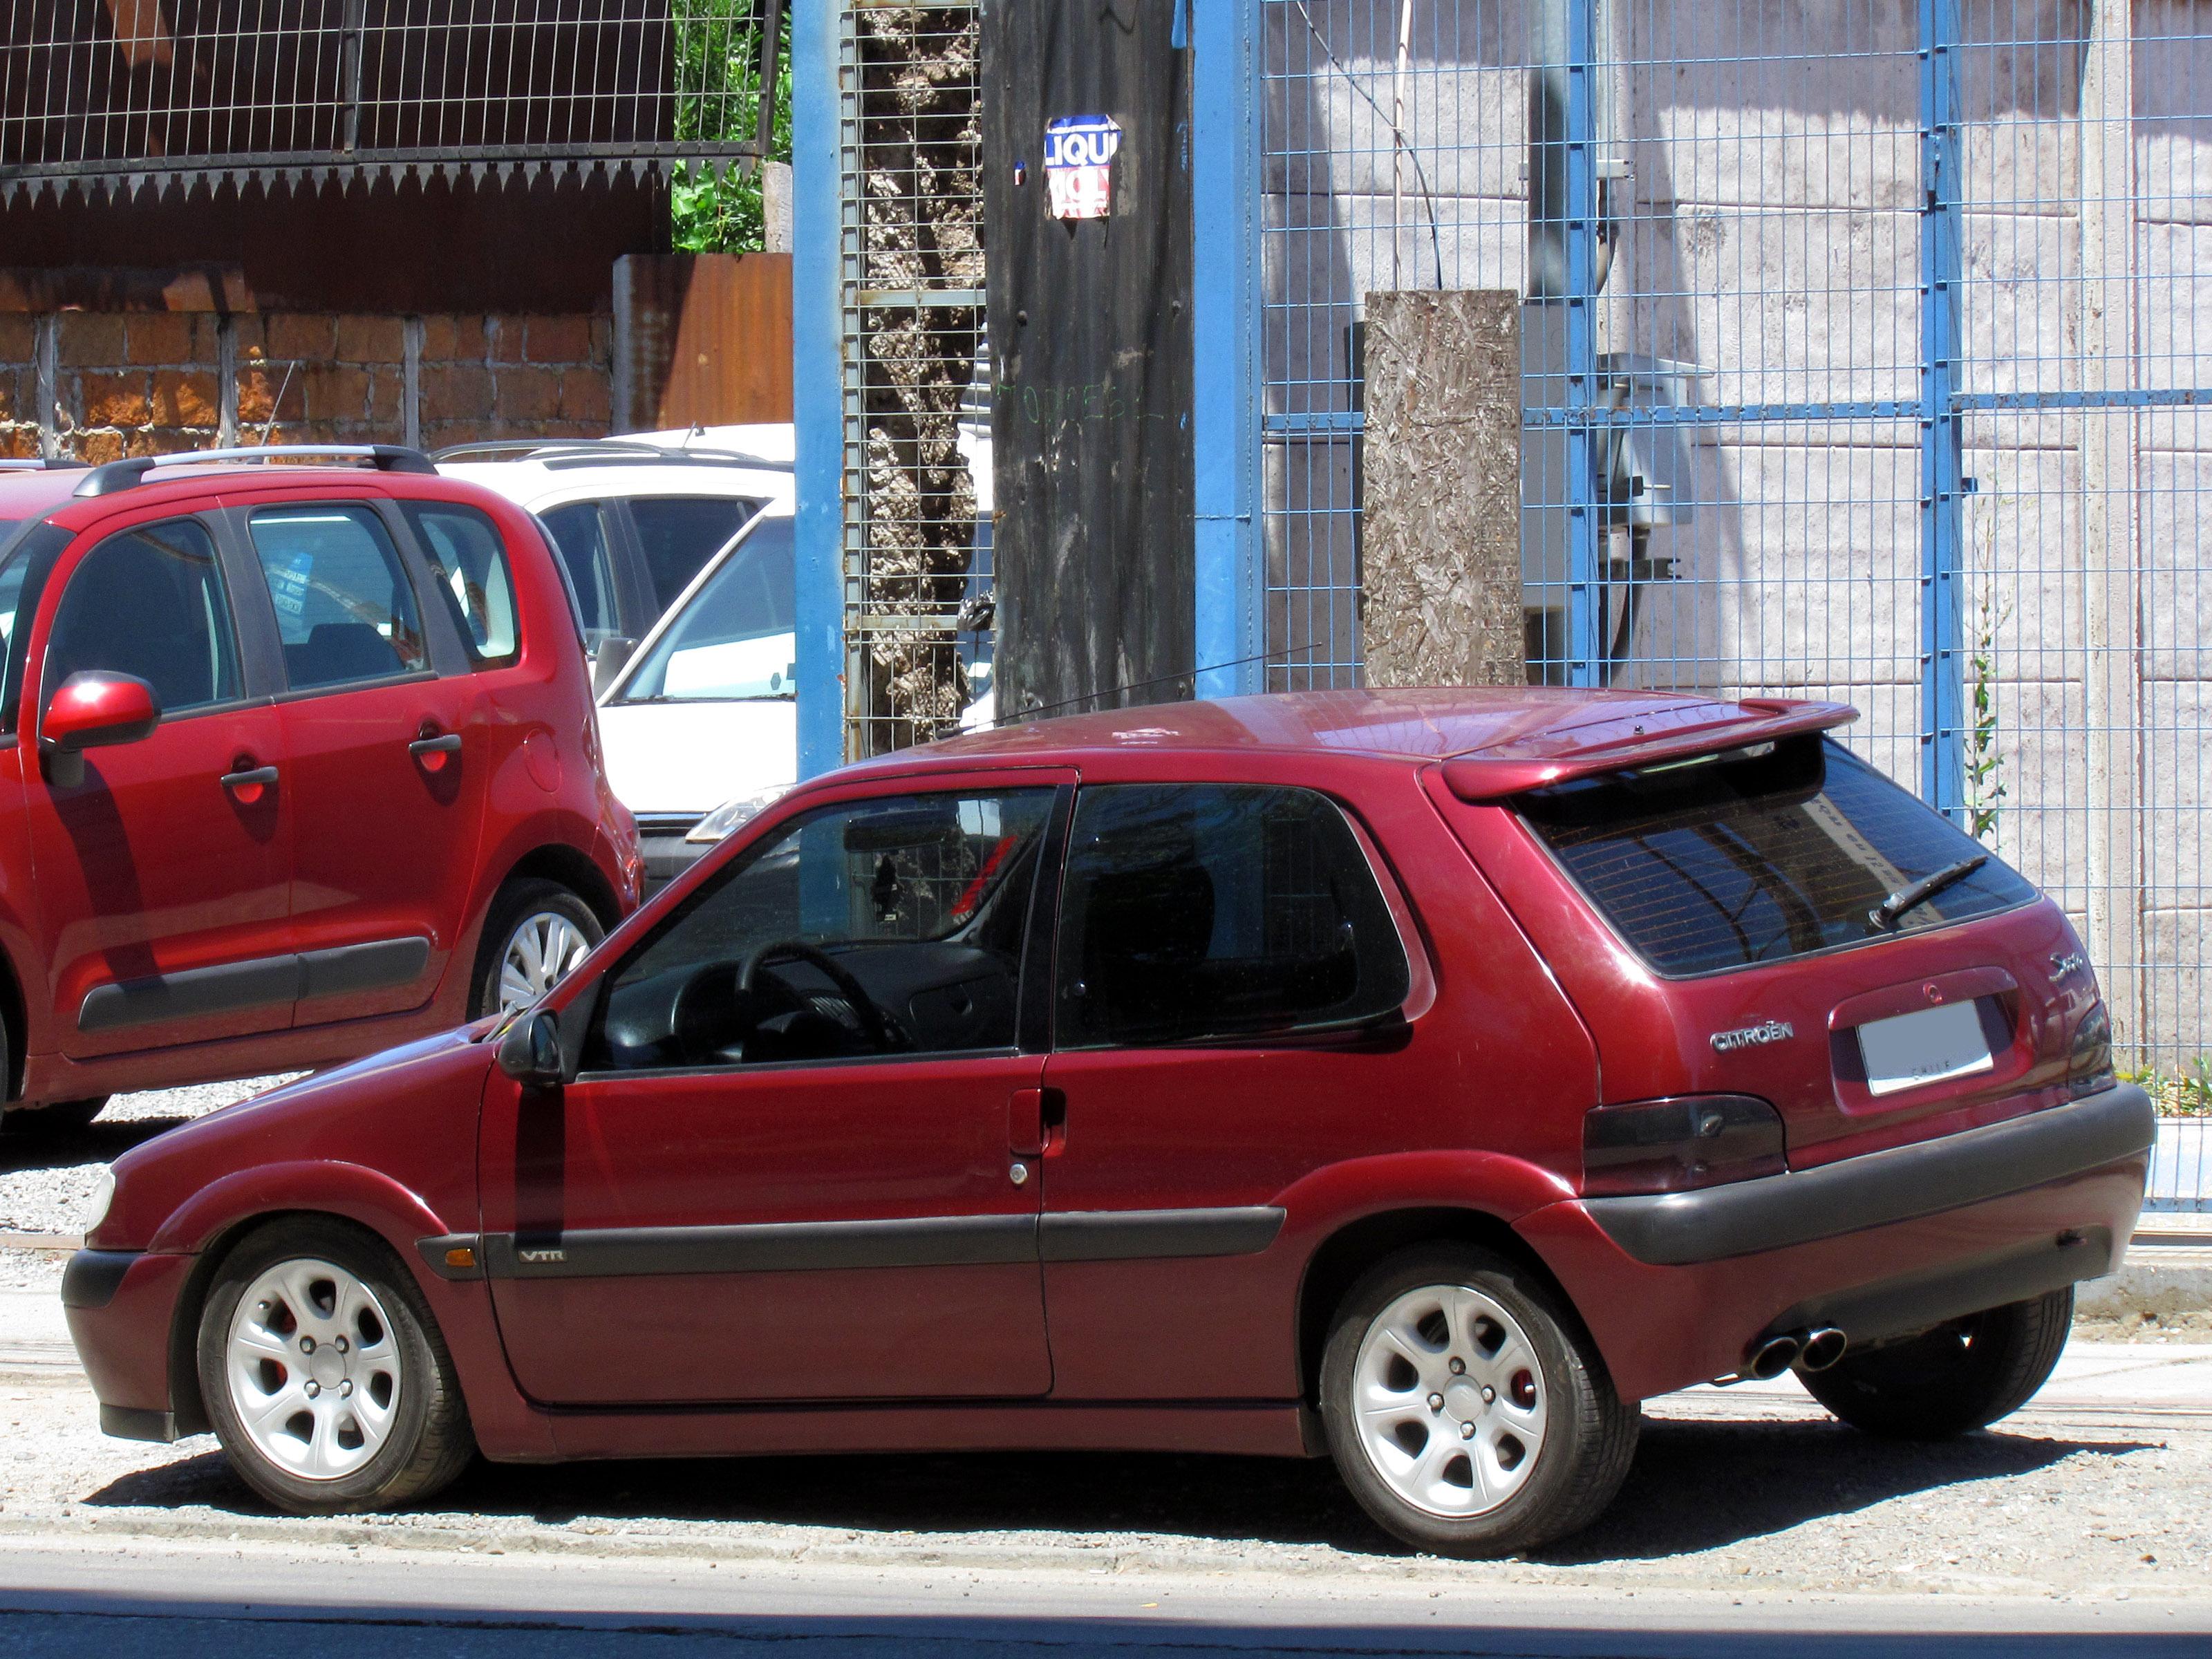 file citroen saxo vtr 1998 15521935623 jpg wikimedia commons rh commons wikimedia org Modified Citroen Saxo Citroen Saxo Belter